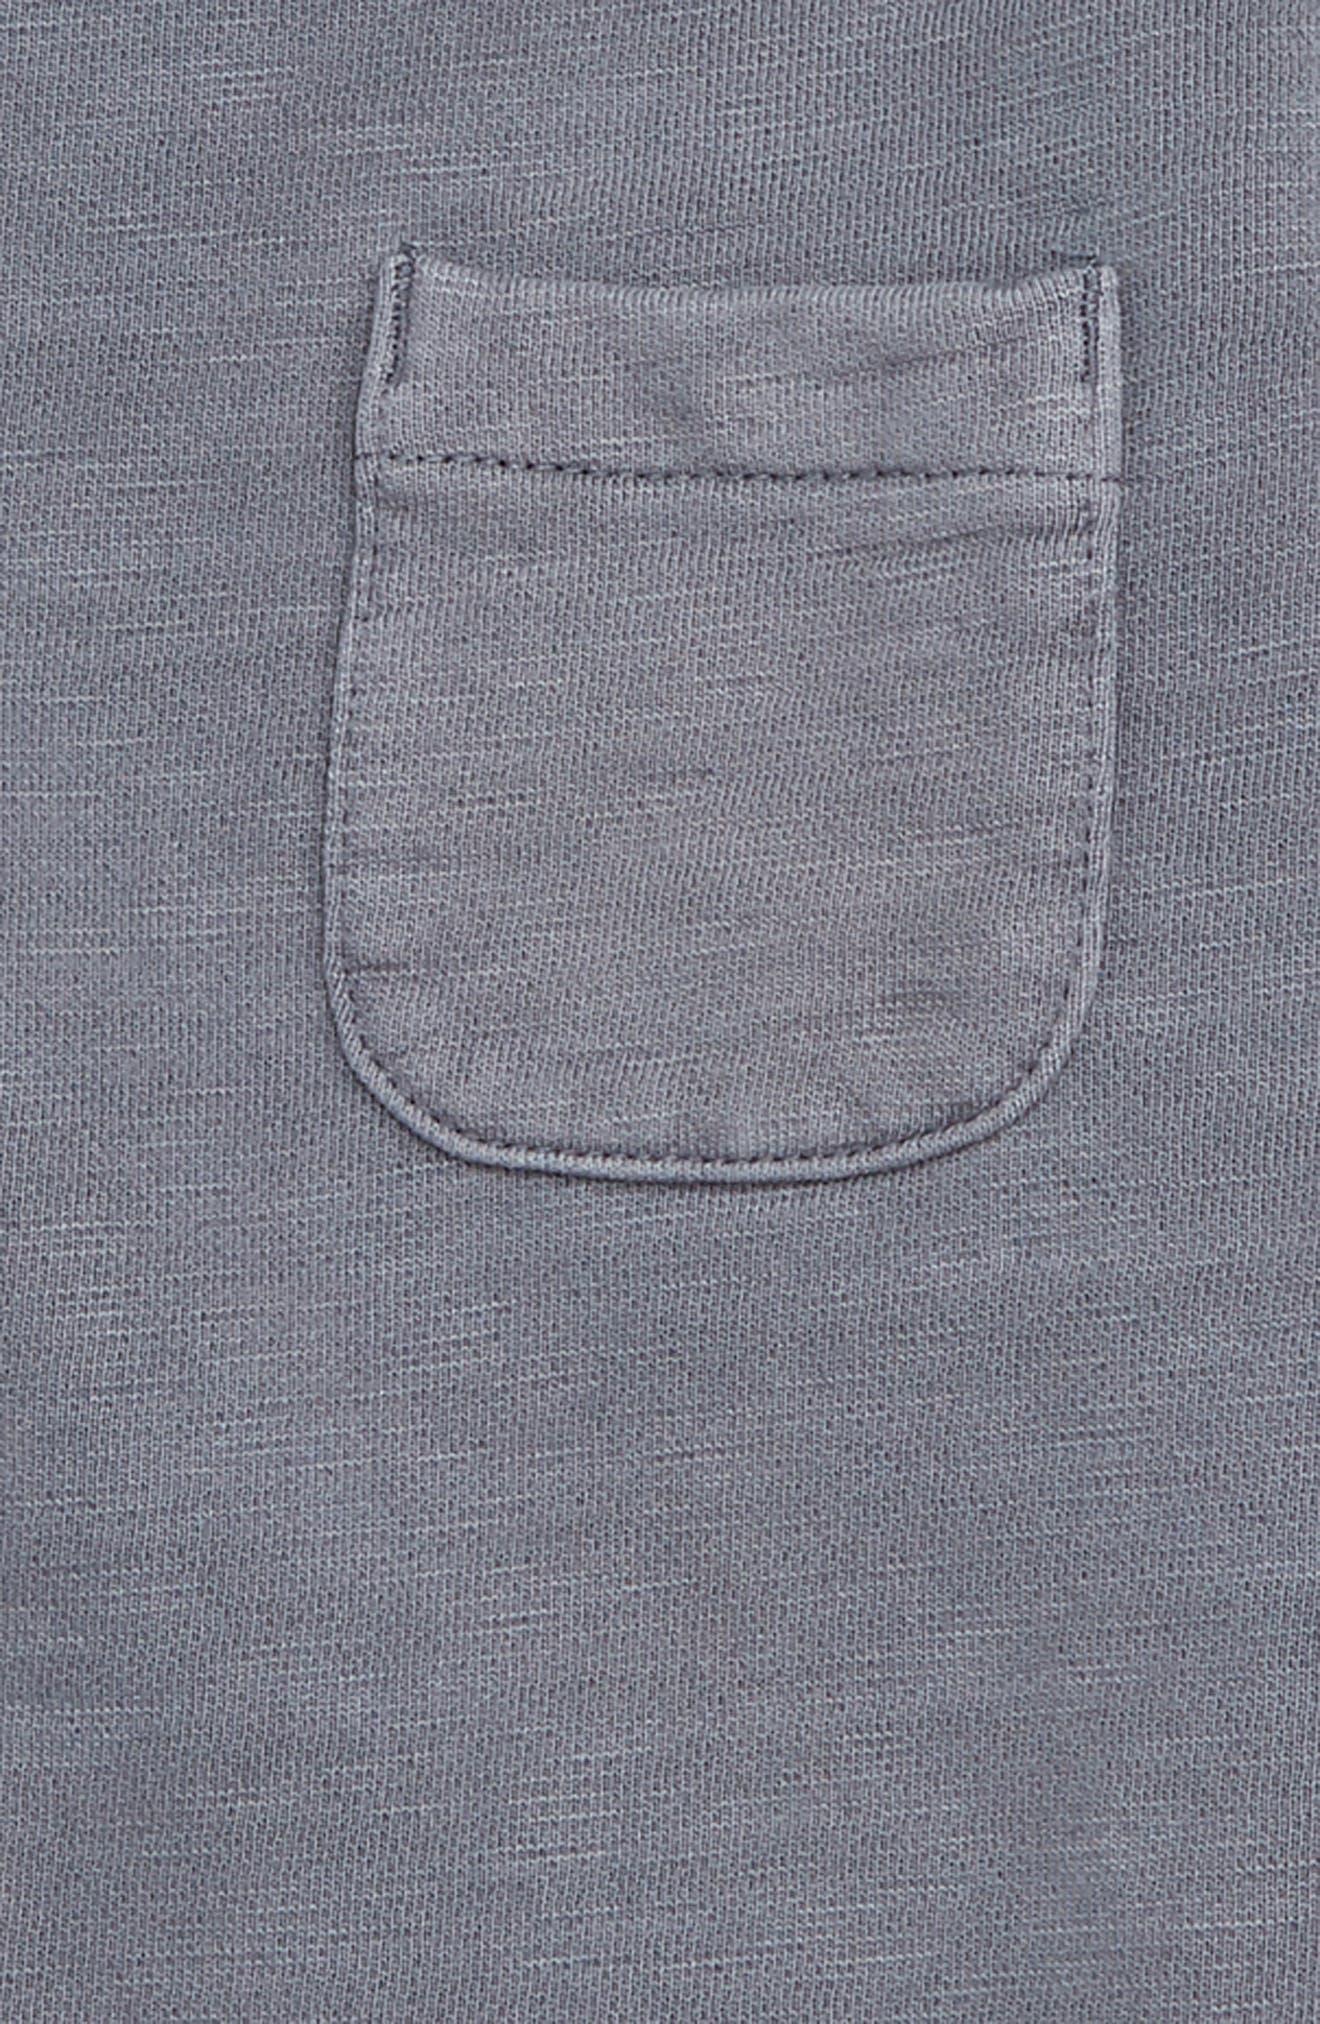 MINI BODEN,                             Pocket Crewneck Sweatshirt,                             Alternate thumbnail 2, color,                             062